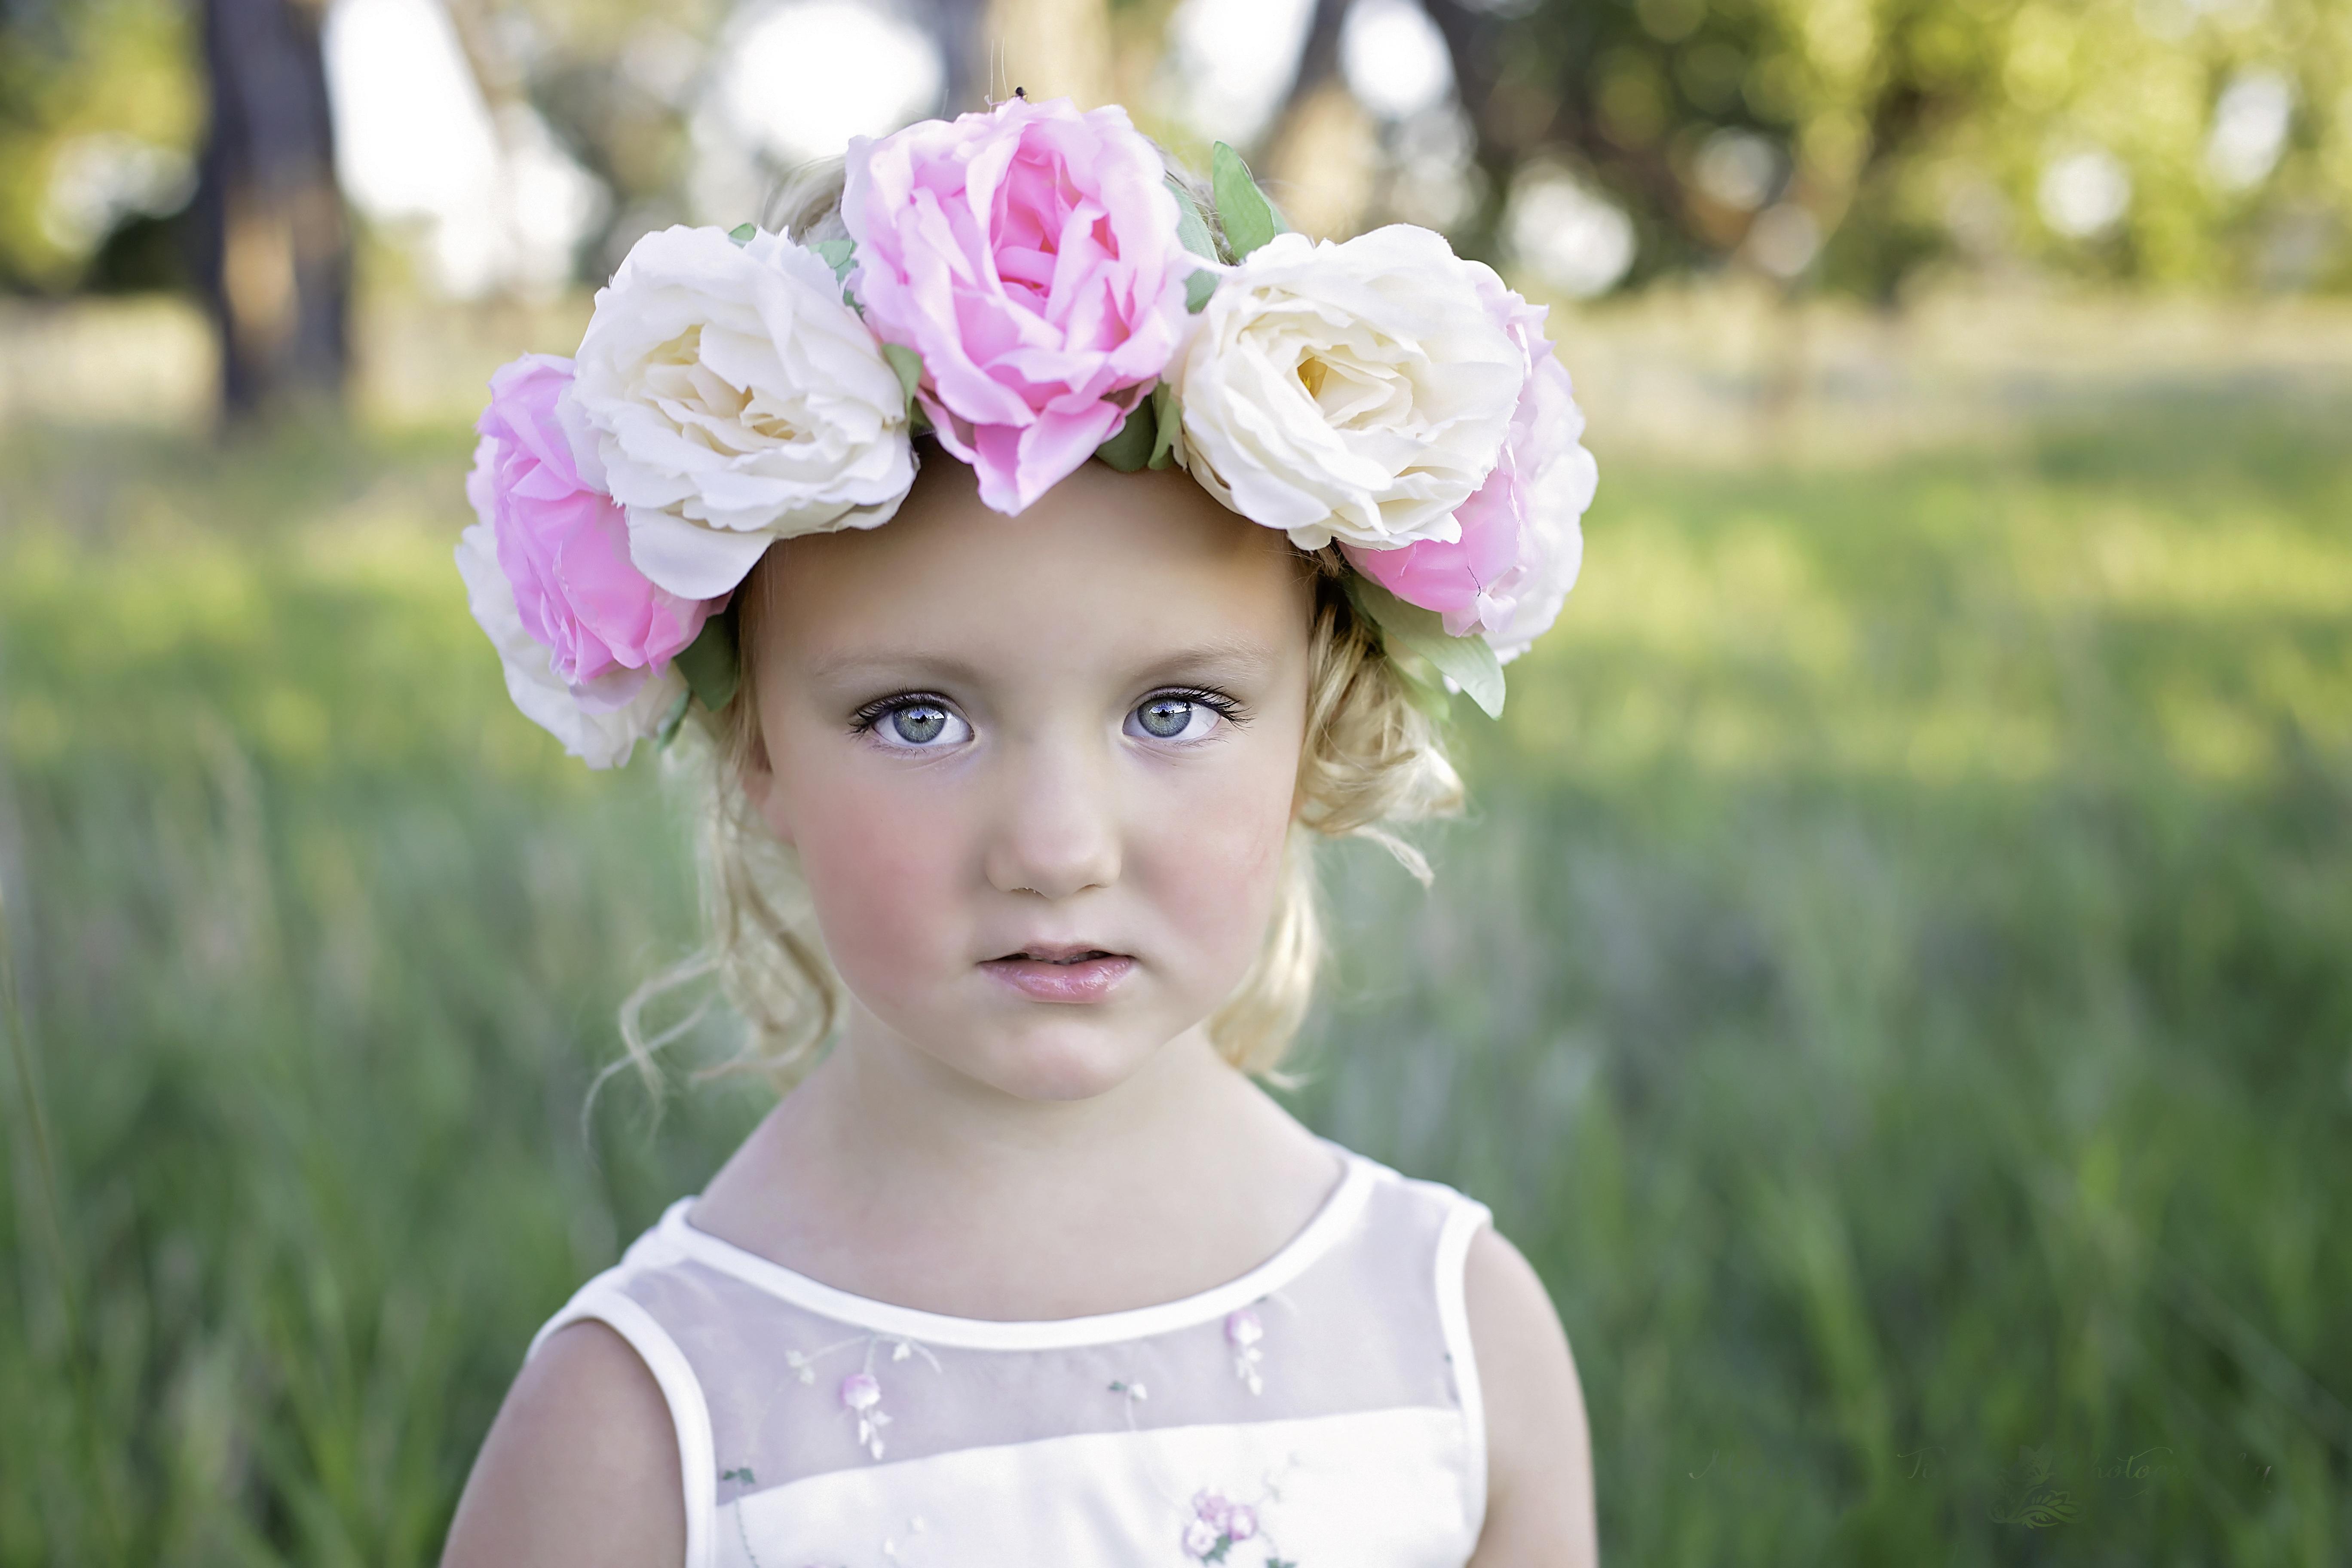 4fa6d3451 persona planta niña mujer fotografía flor linda verano retrato primavera  niño ropa rosado novia venda vestir